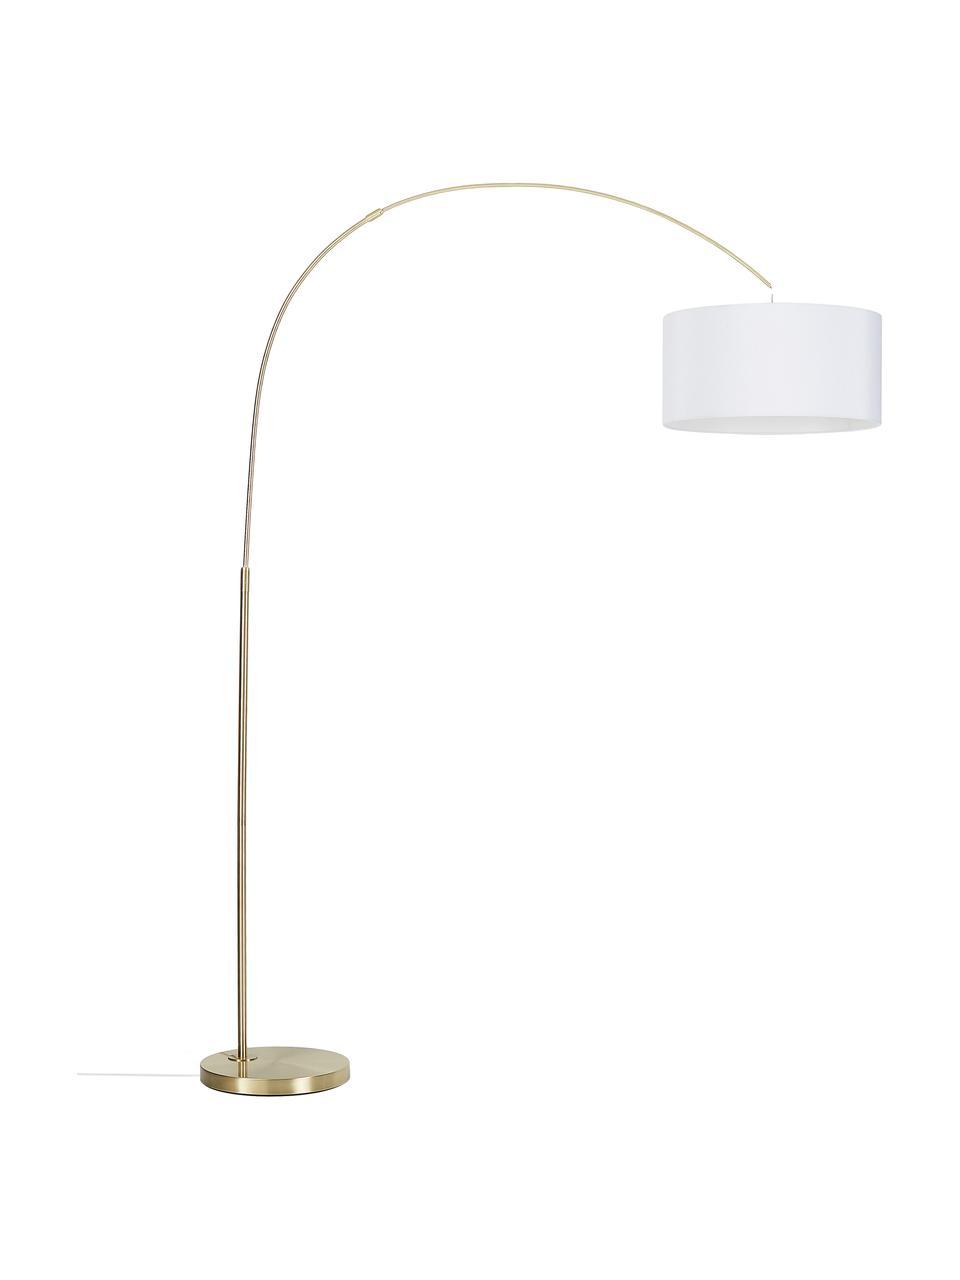 Große Bogenlampe Niels in Messing, Lampenfuß: Metall, gebürstet, Lampenschirm: Textil, Weiß, Messingfarben, Transparent, Ø 50 x H 218 cm